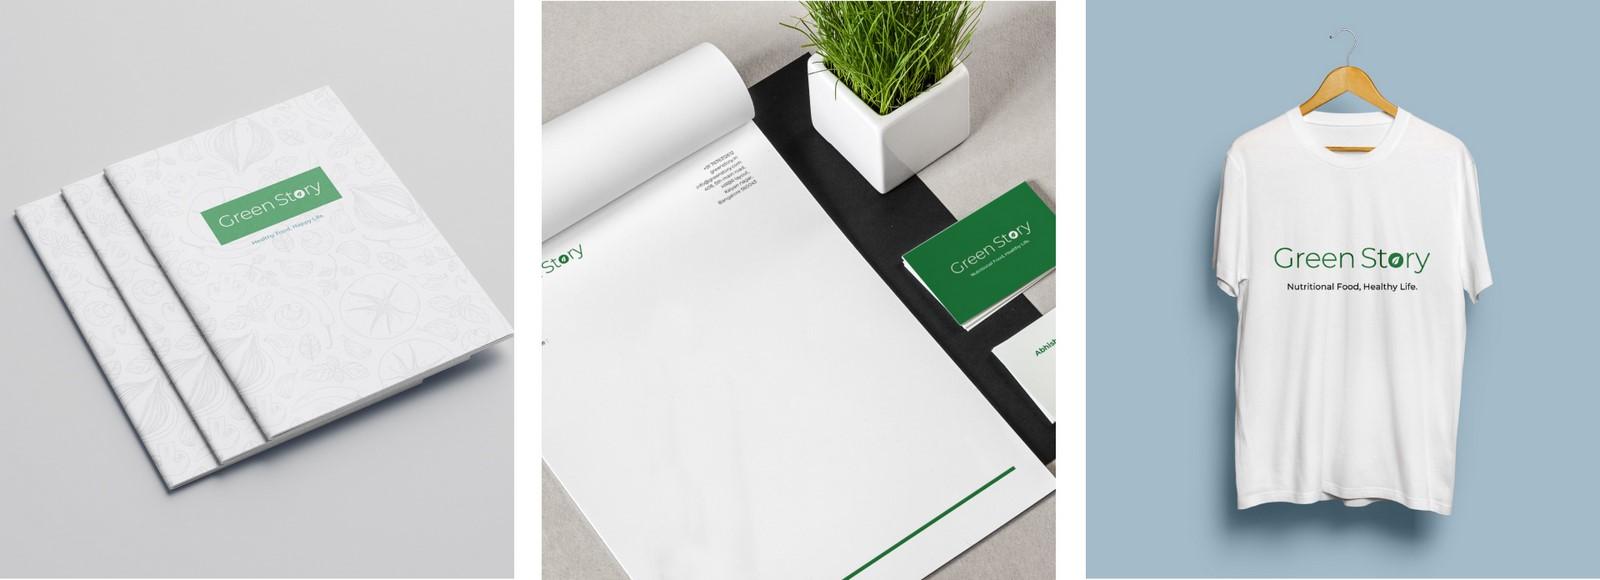 Greenstory Food Delivery - Sheet1